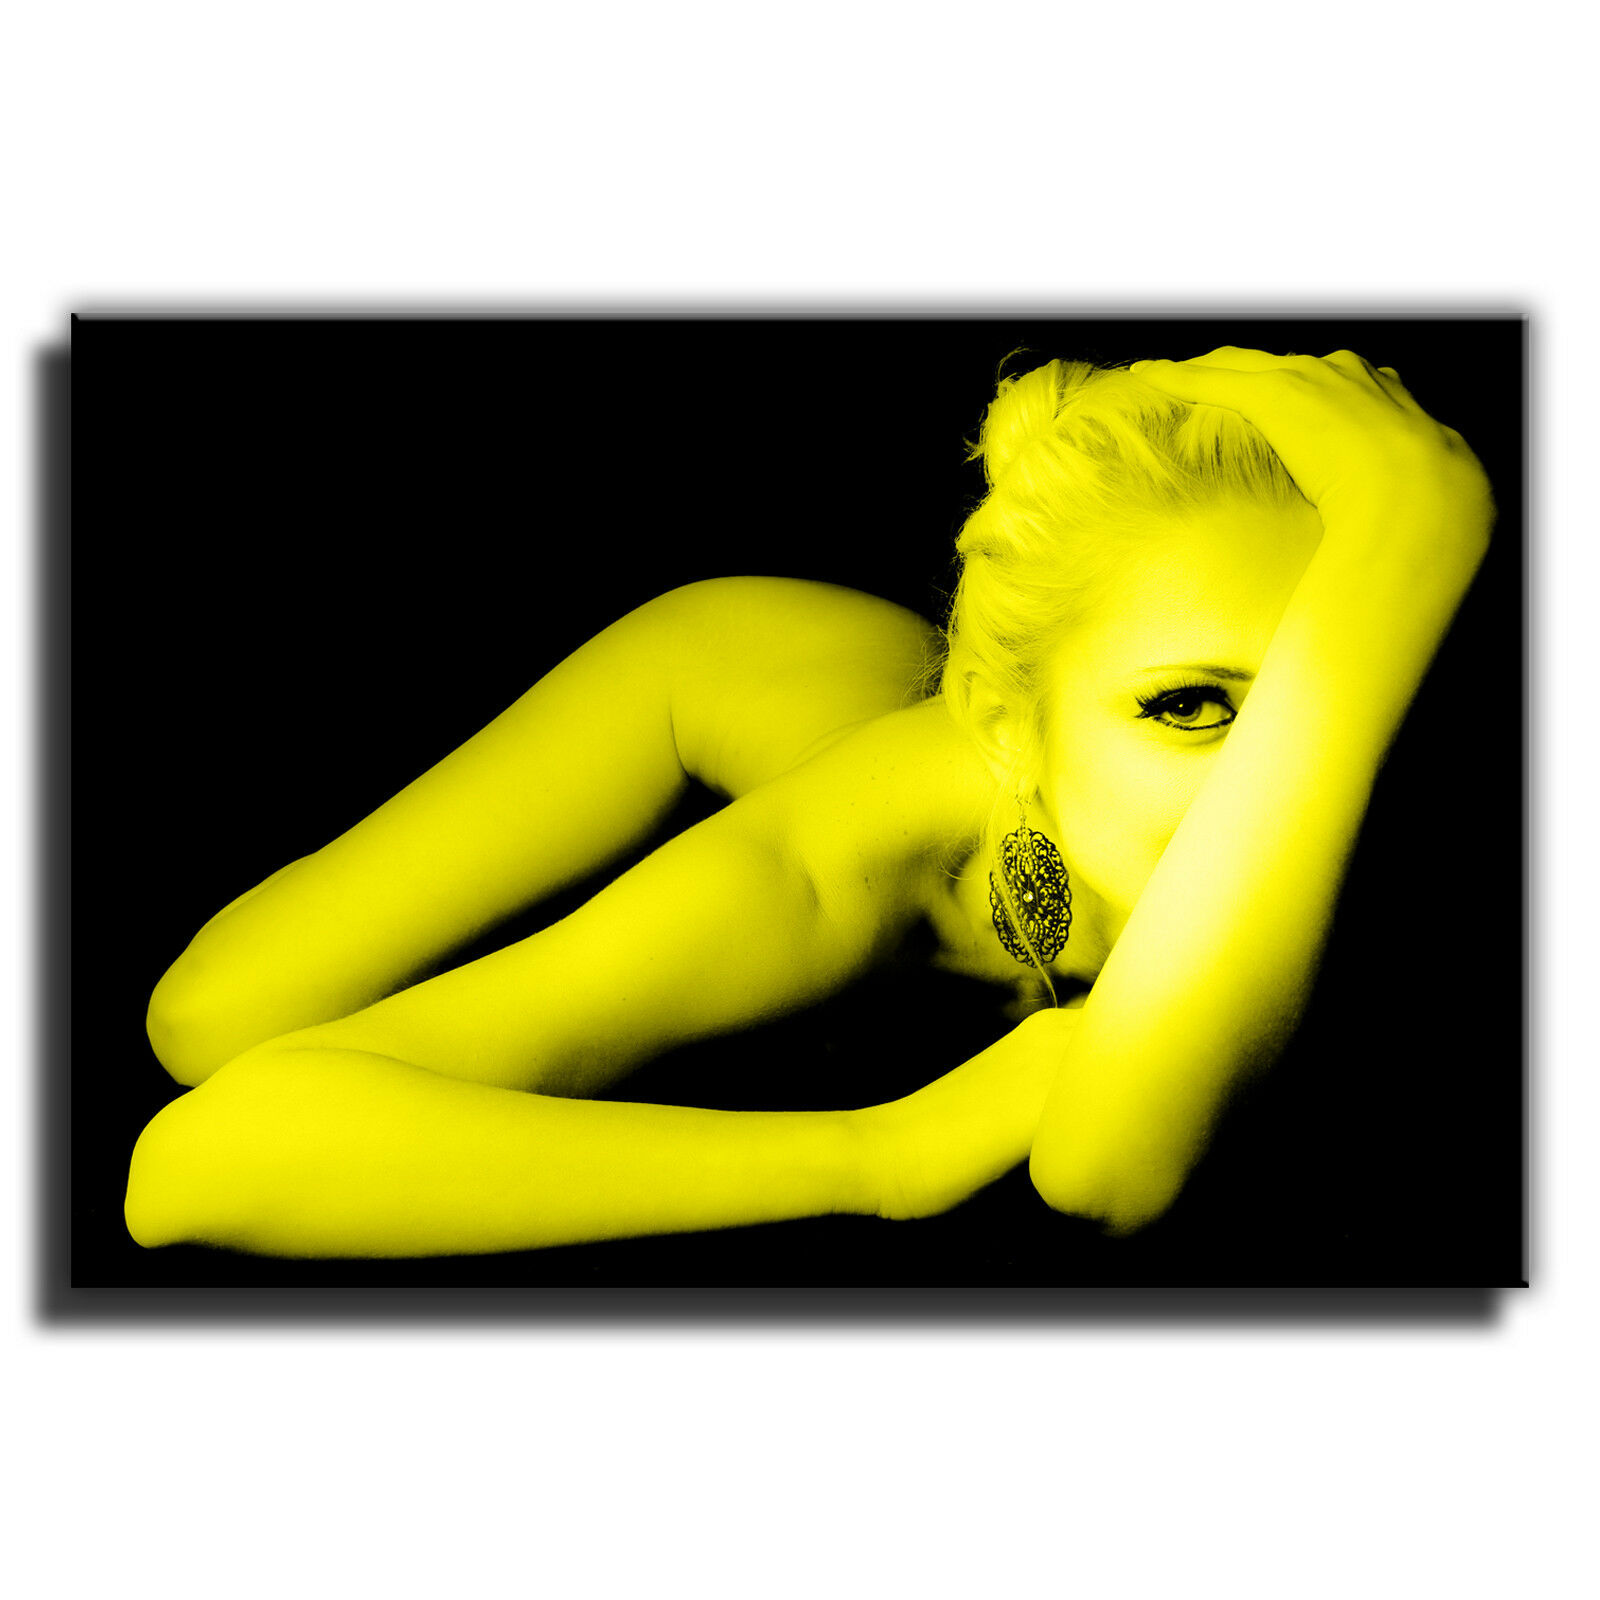 Sexy nu nu Sexy érotique femme single toile murale art photo print 8 d54f56